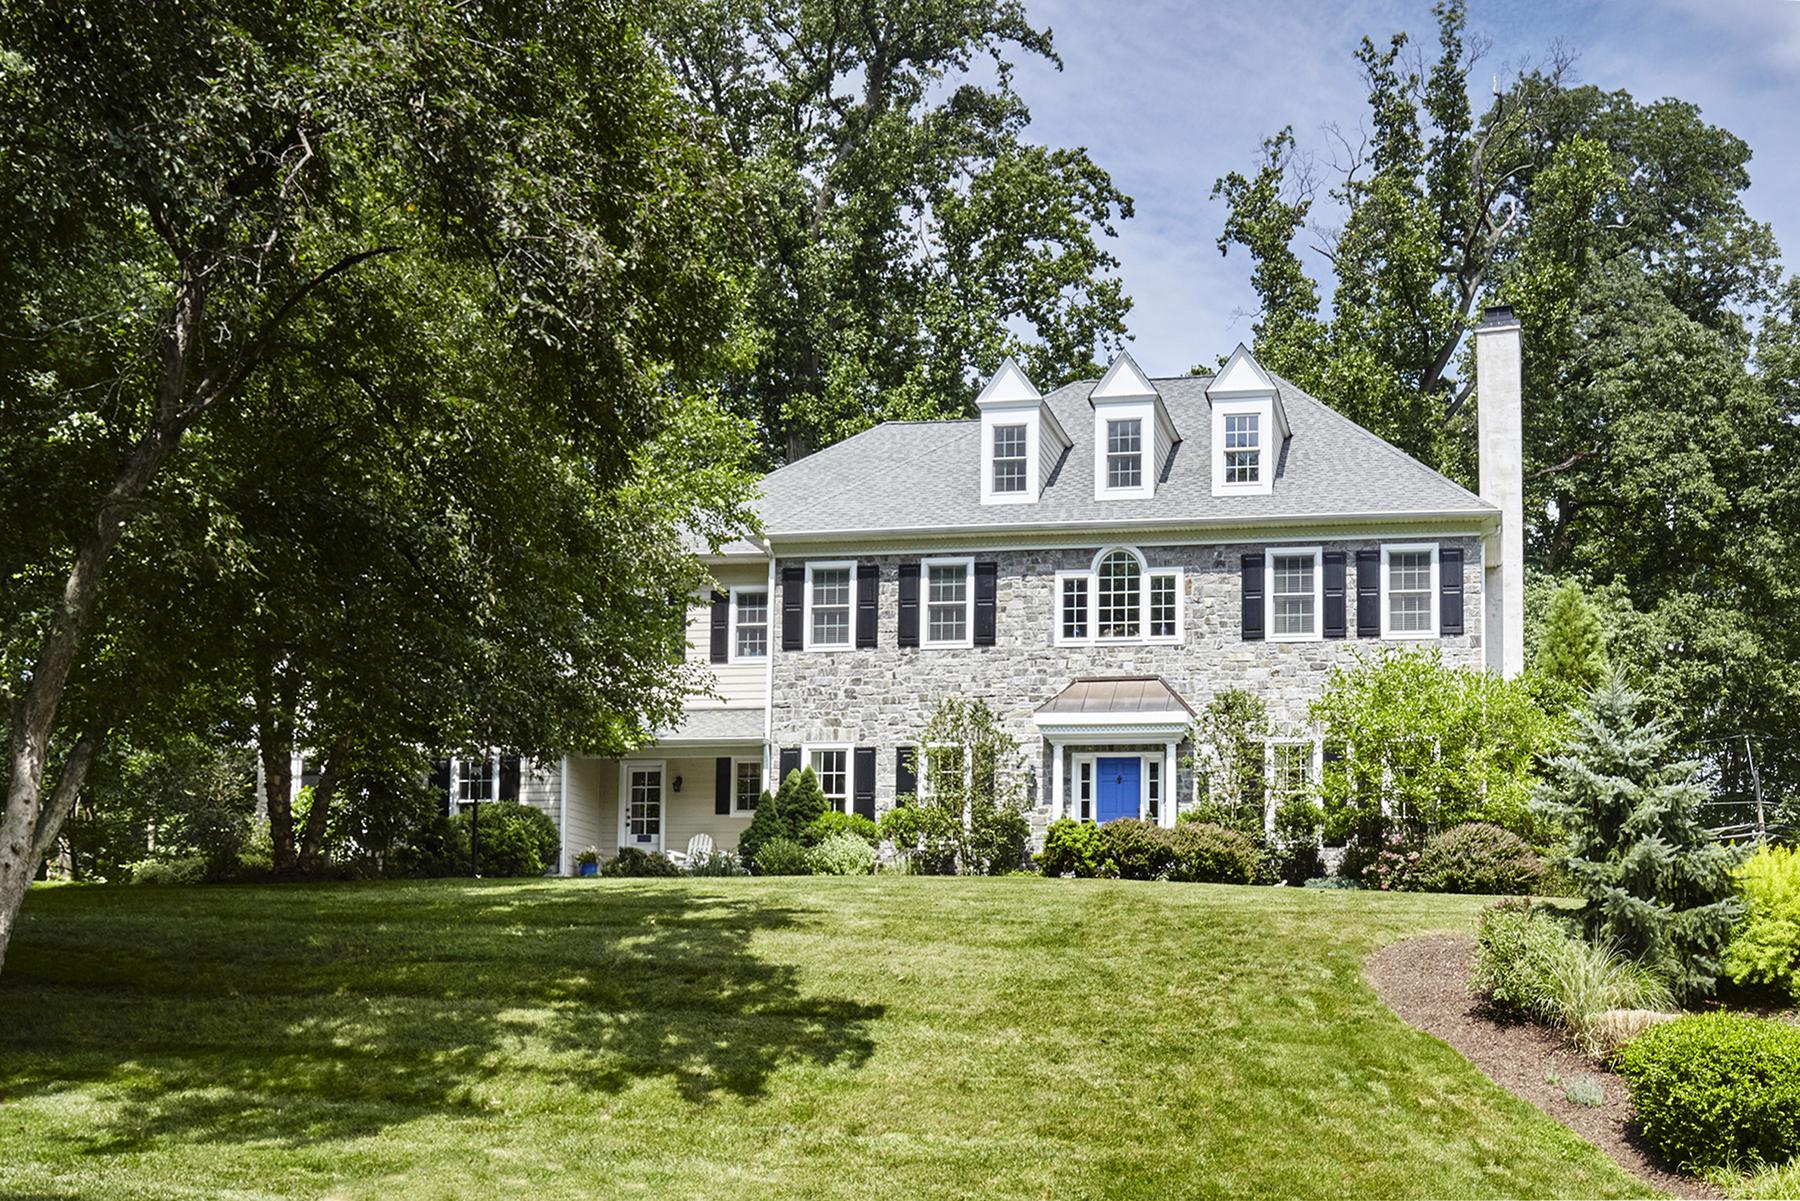 Single Family Home for Sale at Custom Stone Manor Home 799 Robinhood Road Bryn Mawr, Pennsylvania 19010 United States